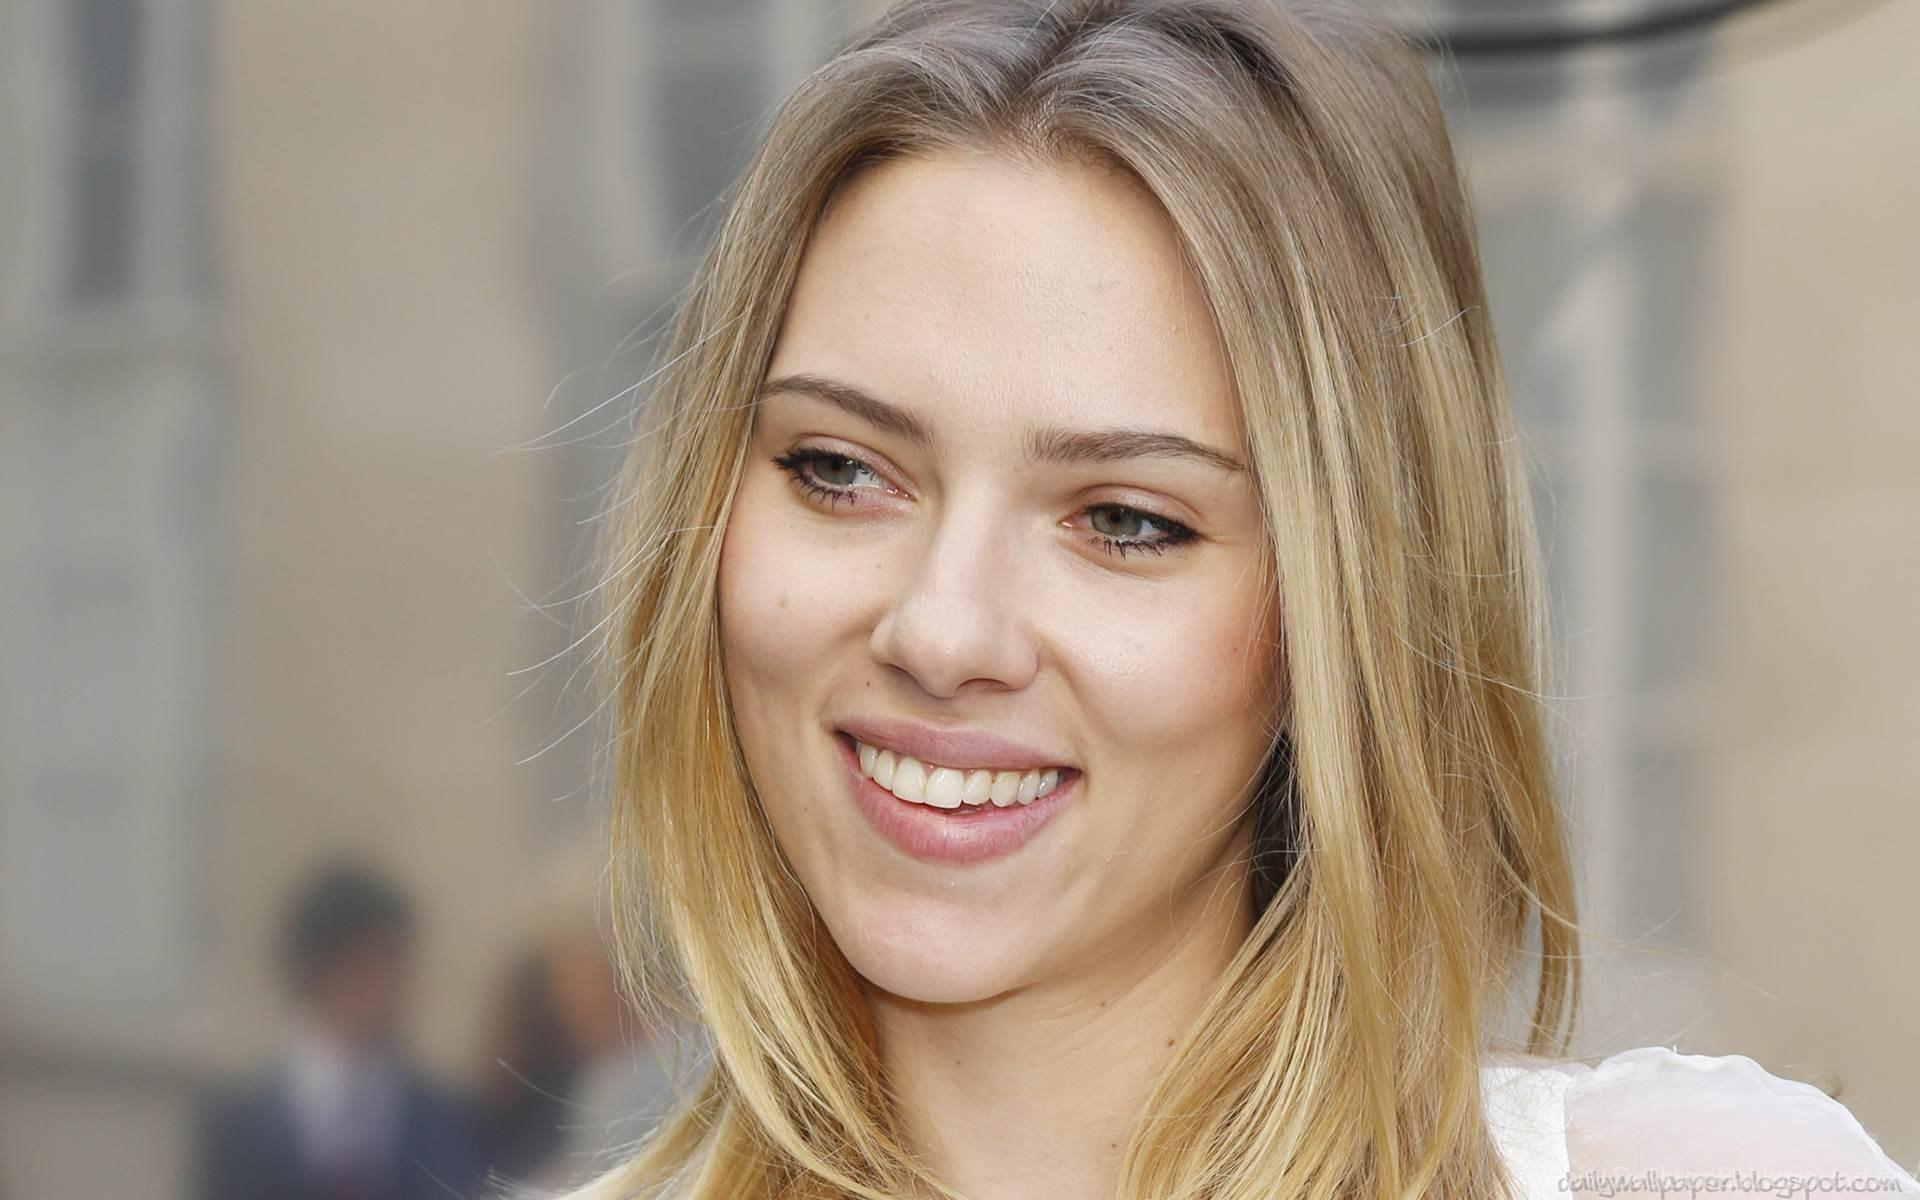 Scarlett Johansson Wallpapers Hd 1080p For Desktop Desktop Background